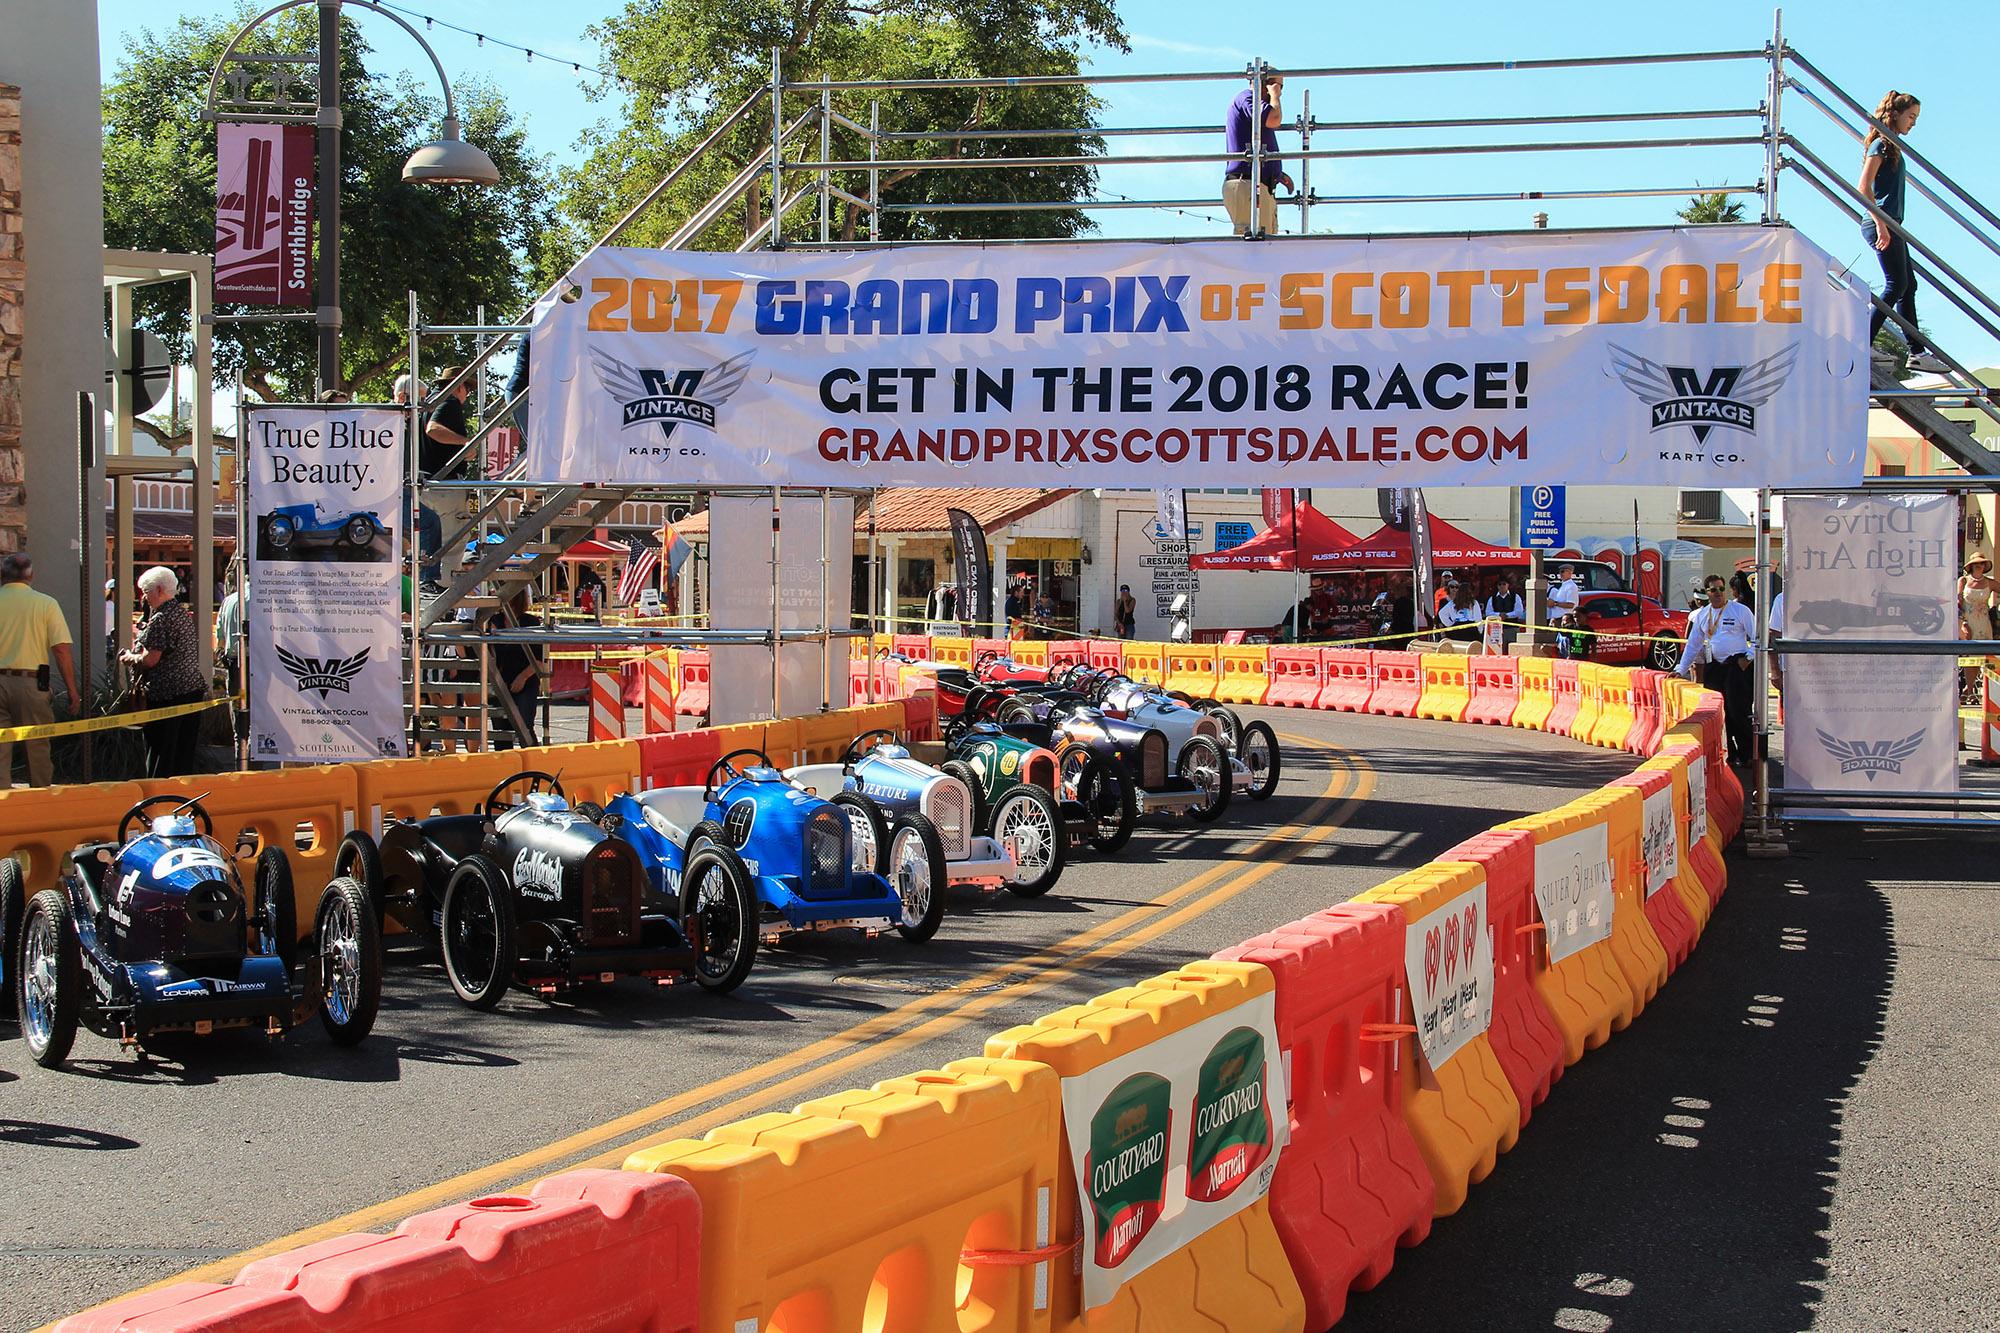 grand prix of scottsdale race course